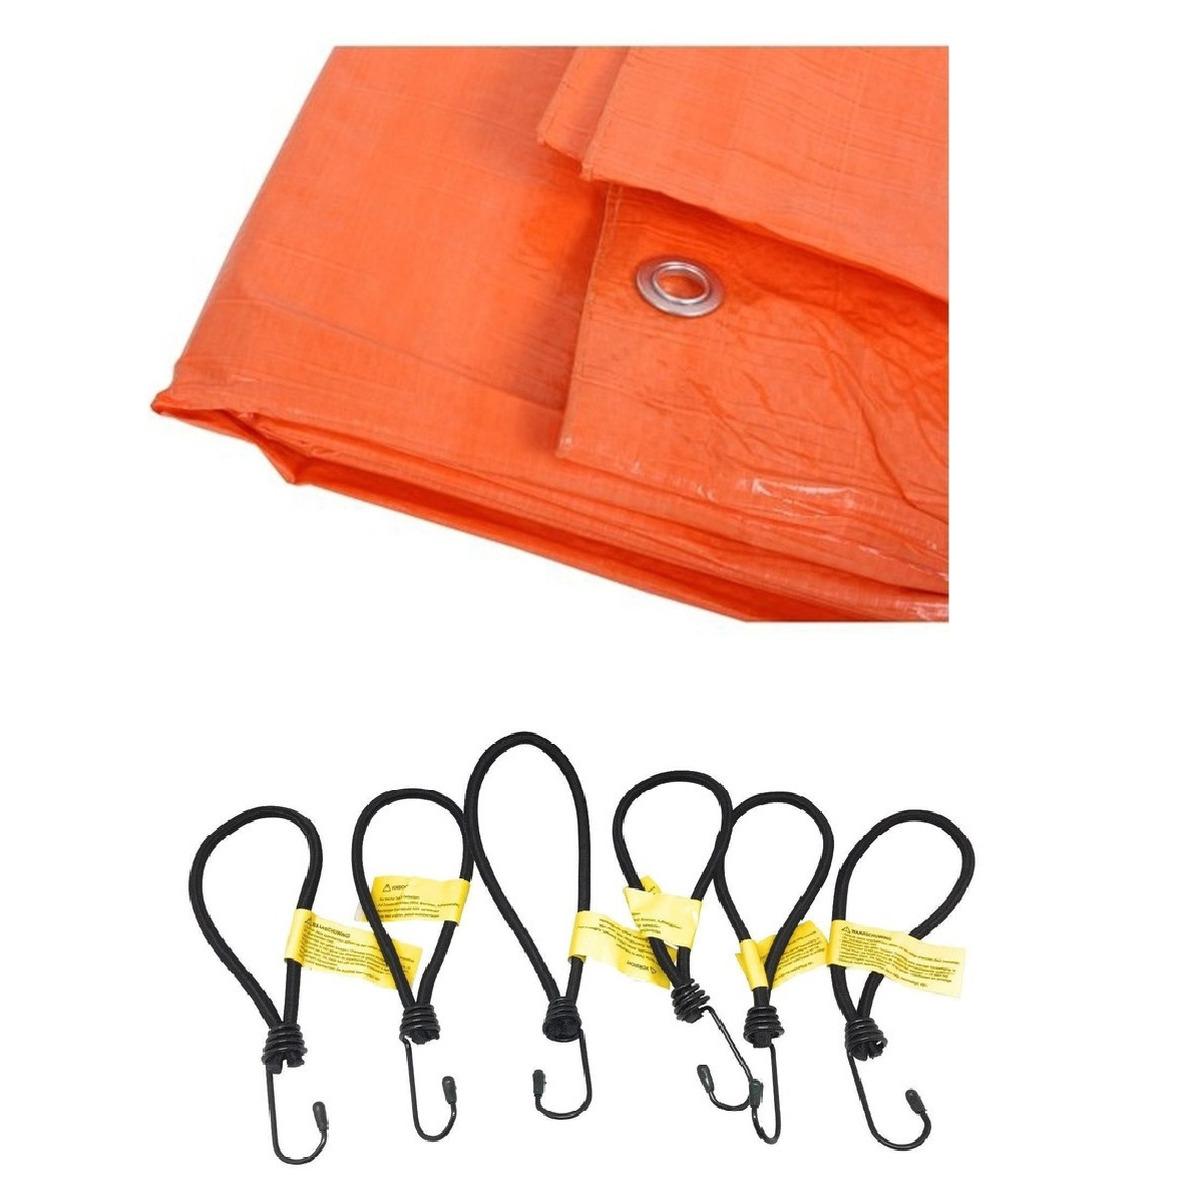 Oranje afdekzeil dekzeil 2 x 3 meter met 12x spanners haakjes